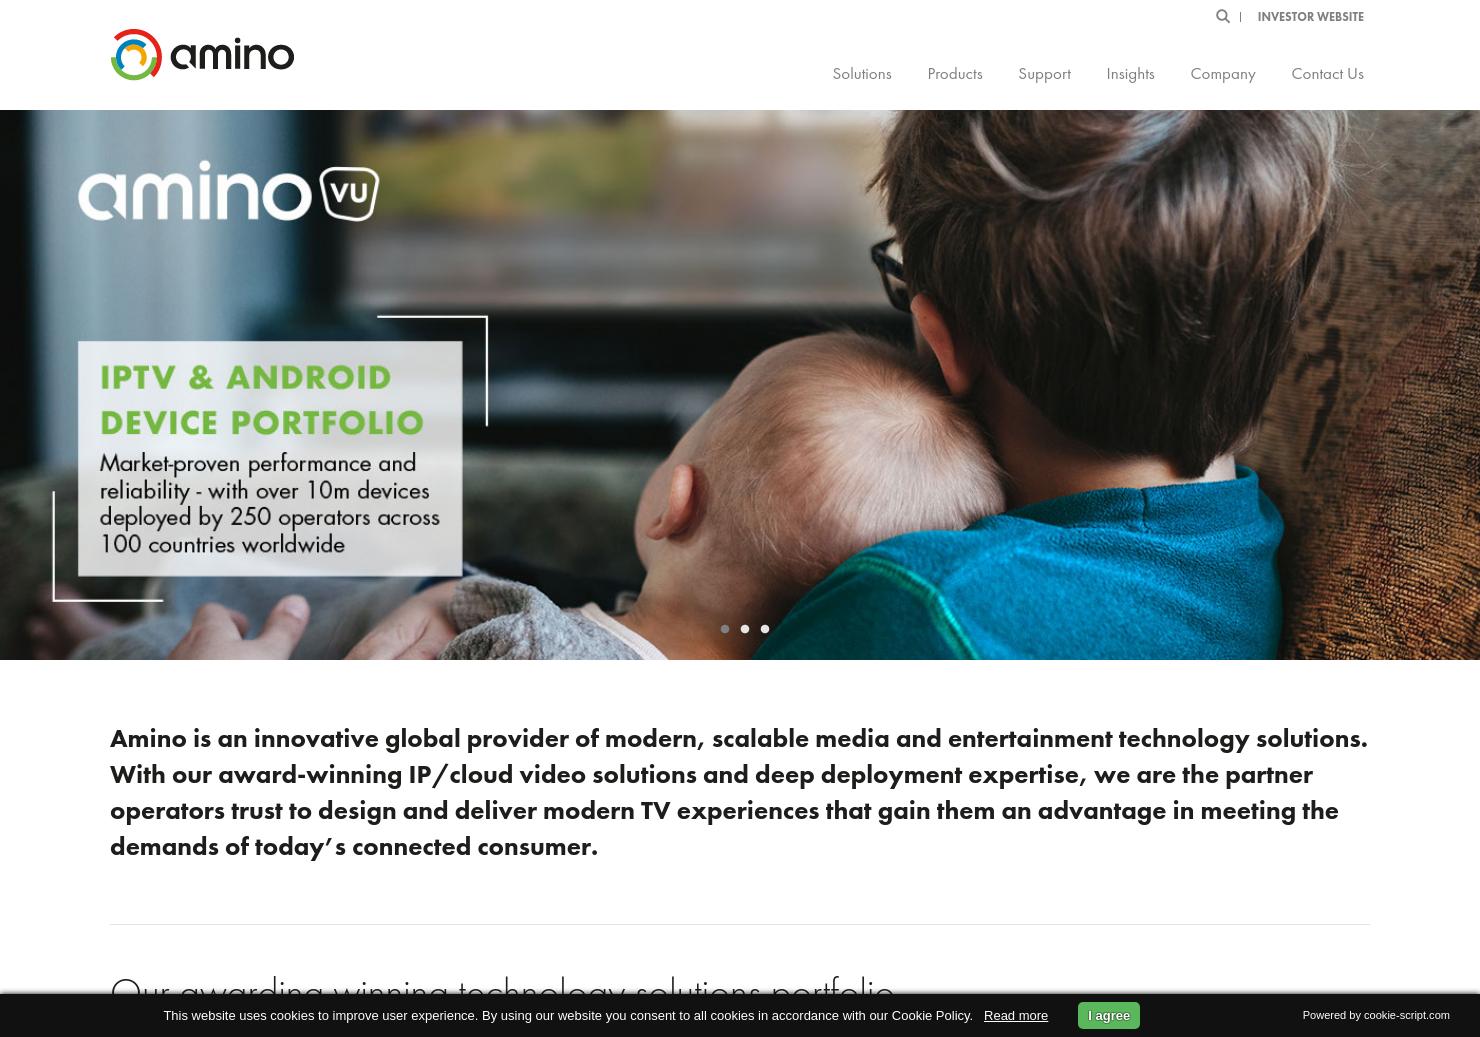 Amino Technologies Home Page